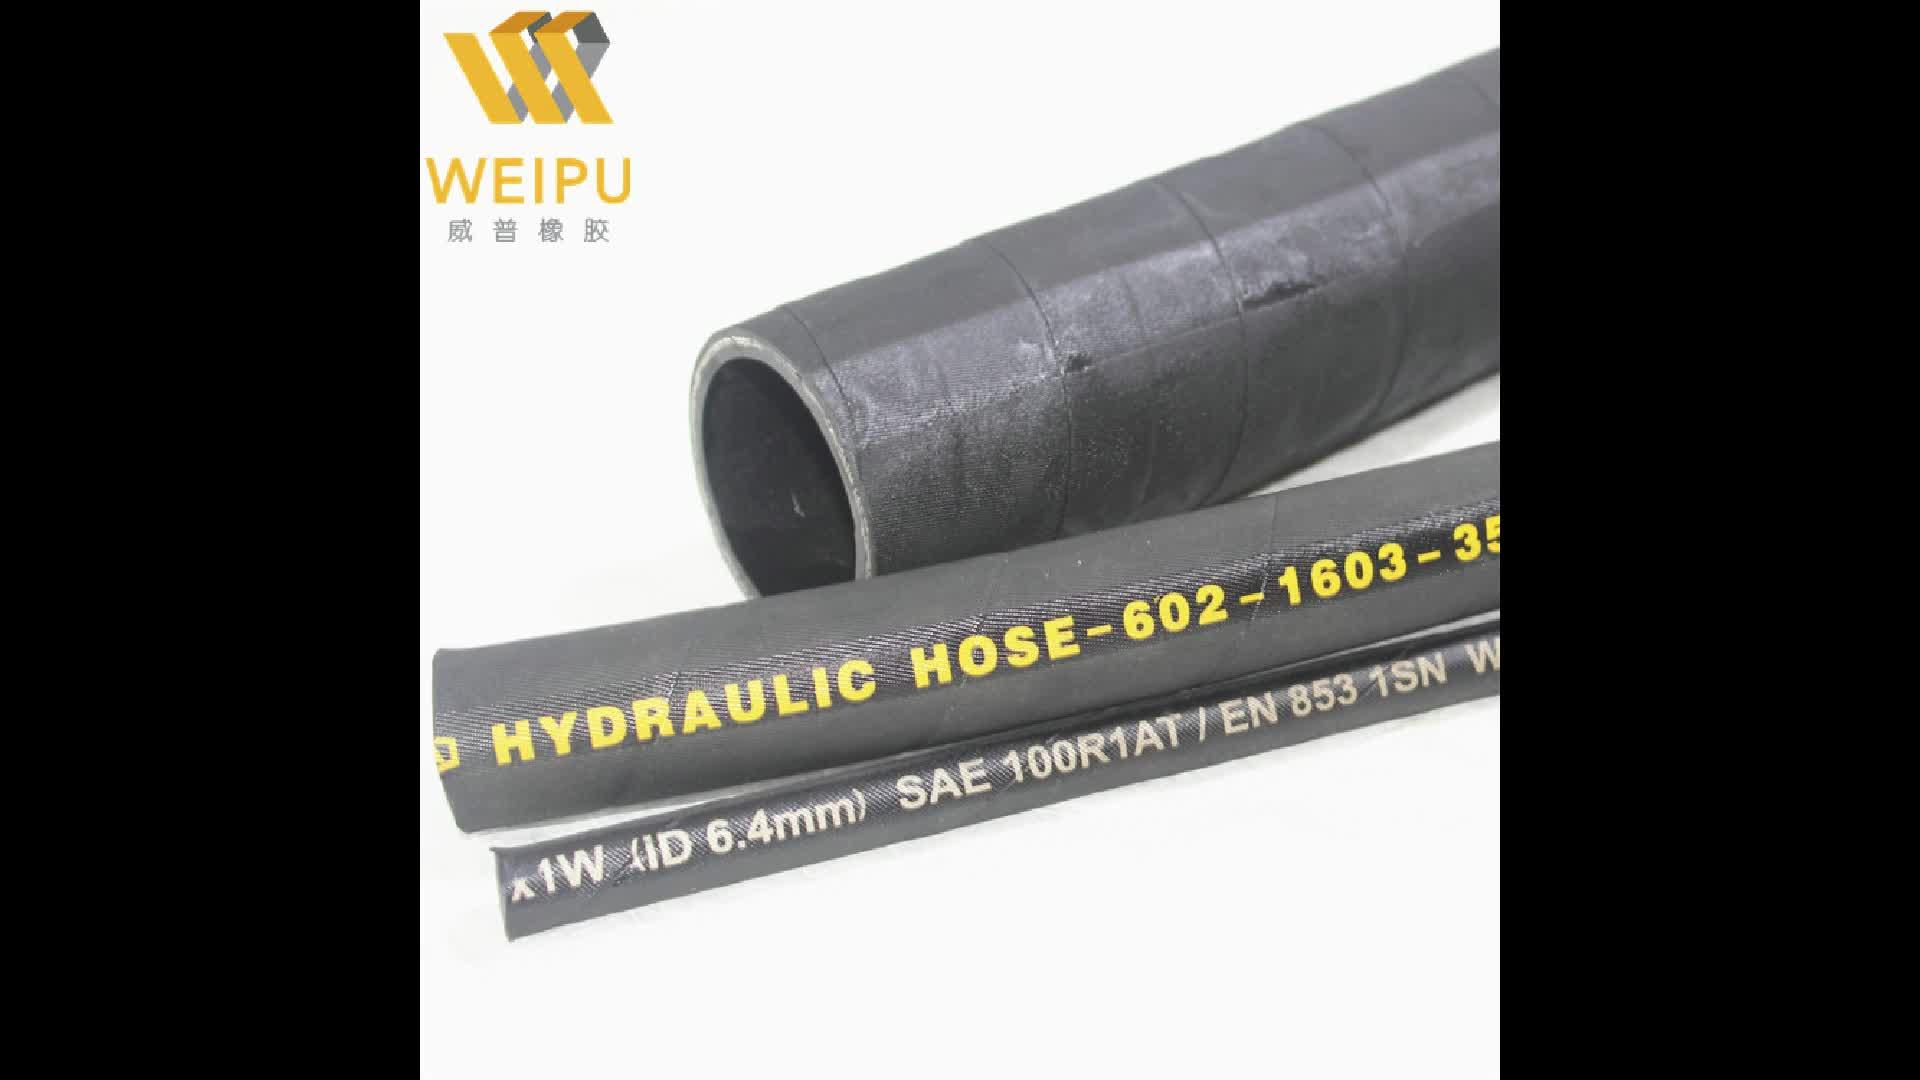 1 inch steel wire woven hydraulic hose pipe